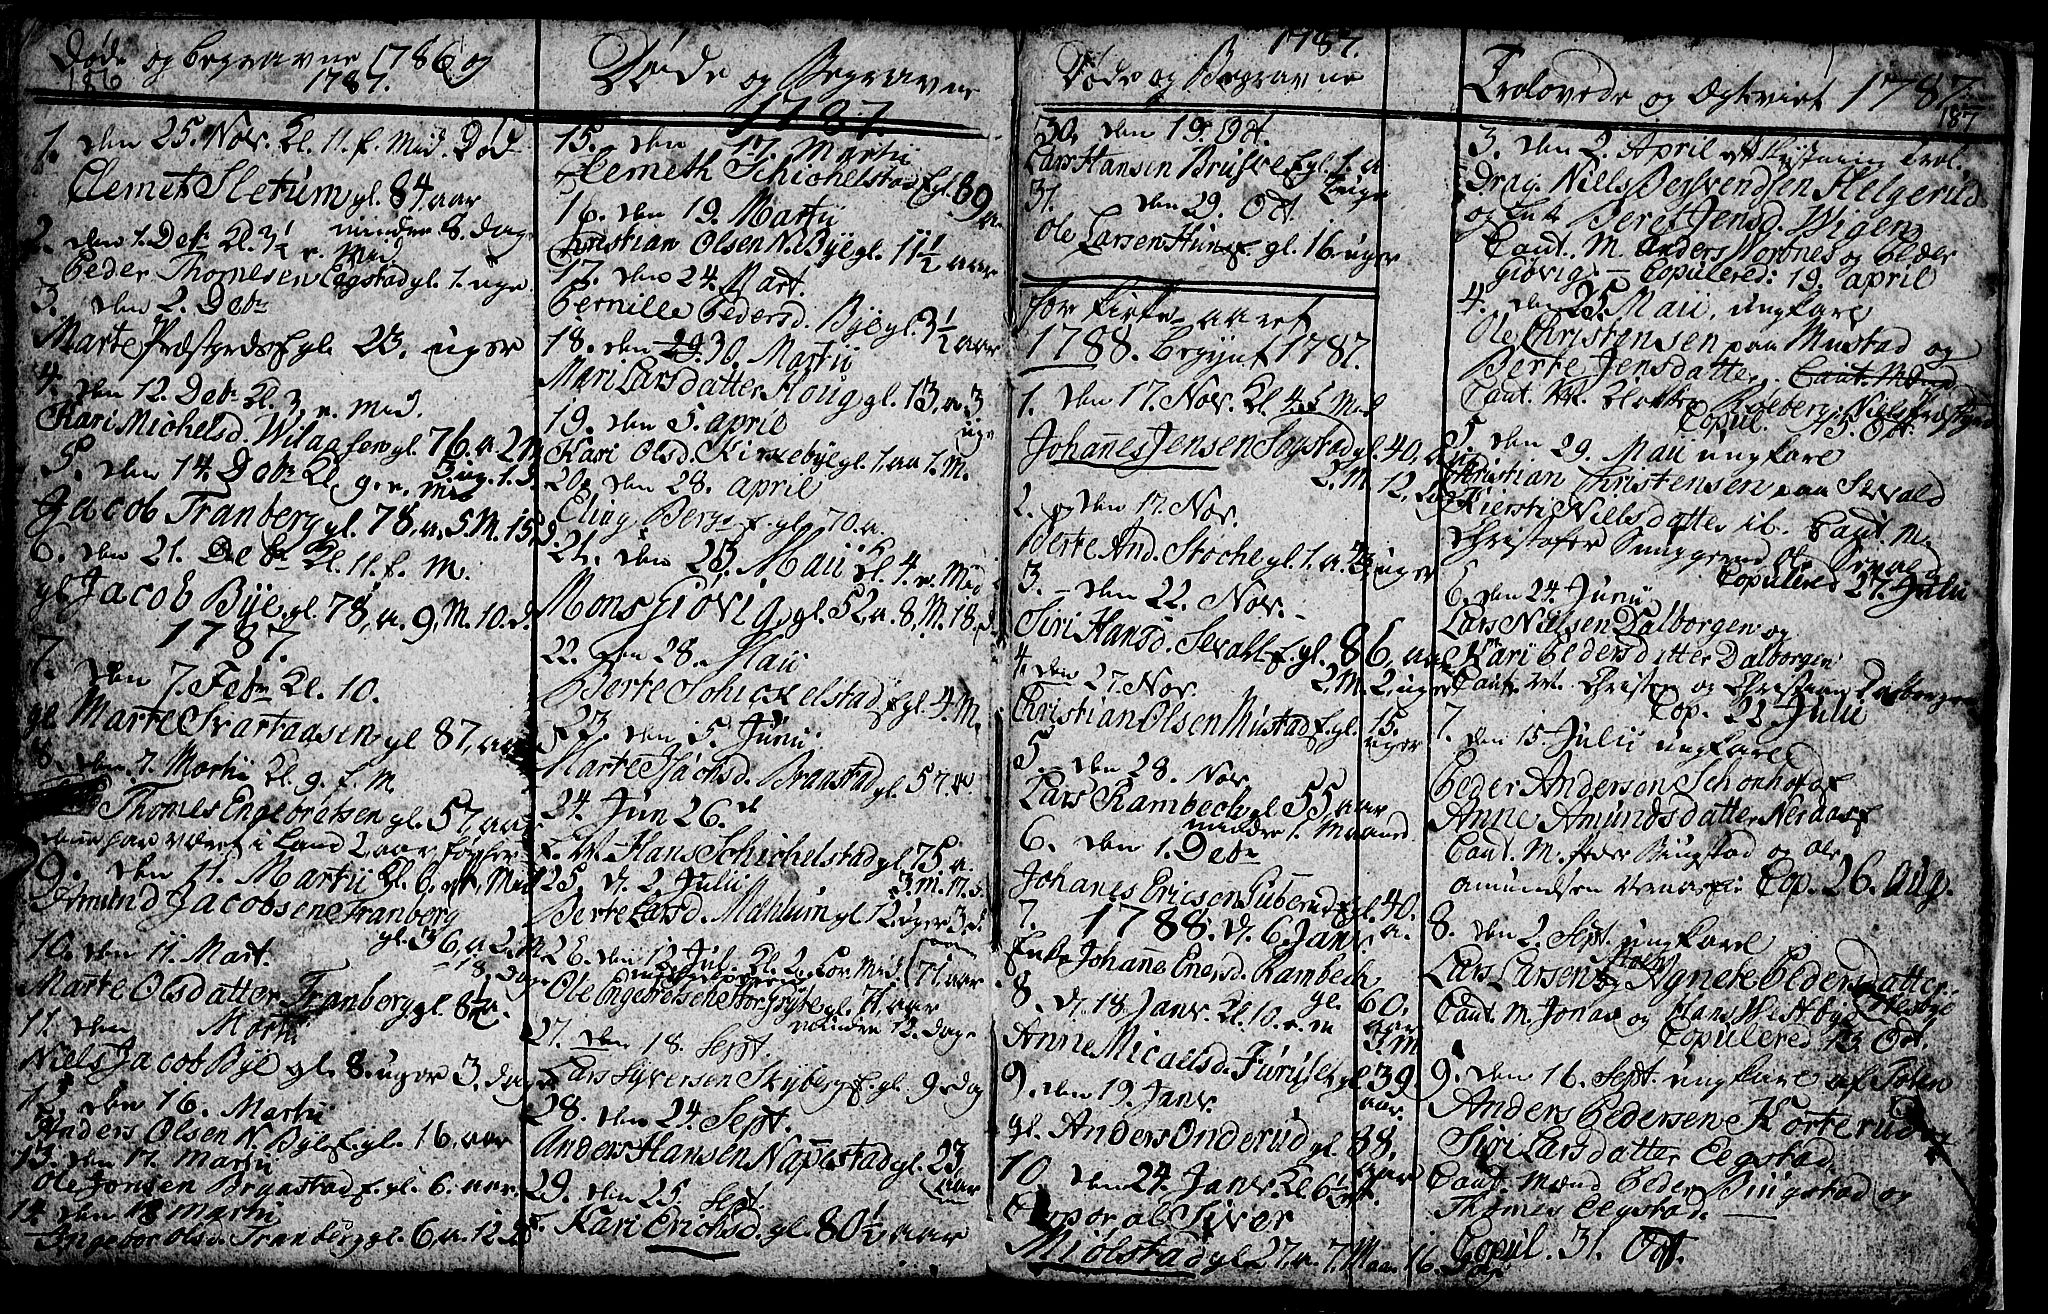 SAH, Vardal prestekontor, H/Ha/Hab/L0001: Klokkerbok nr. 1, 1771-1790, s. 186-187